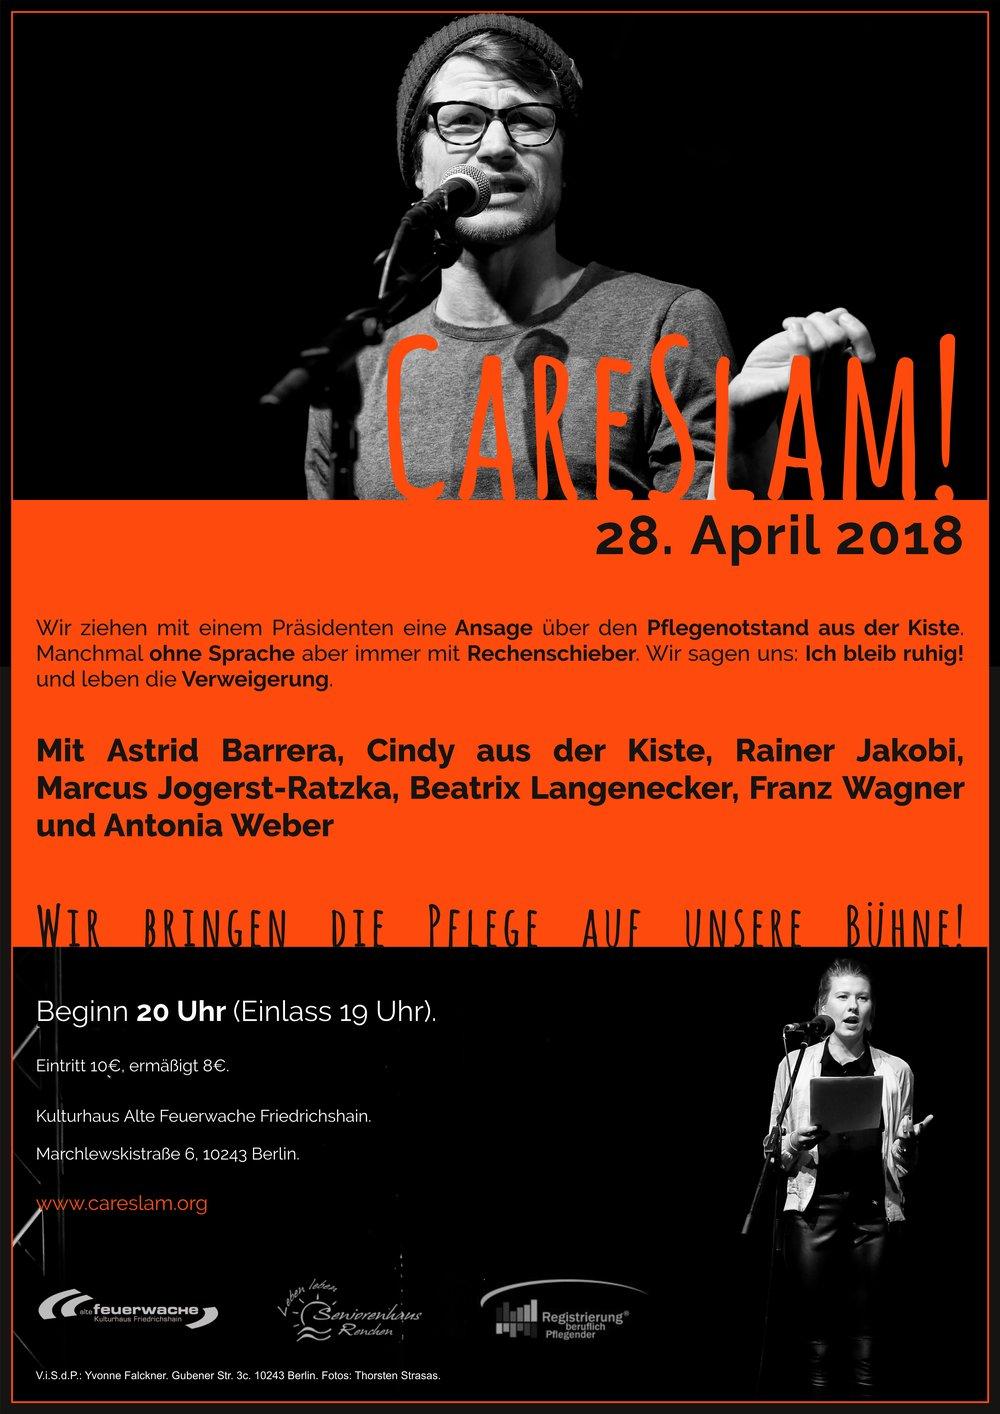 Download Plakat zum CareSlam!10. JPG [4,9MB].